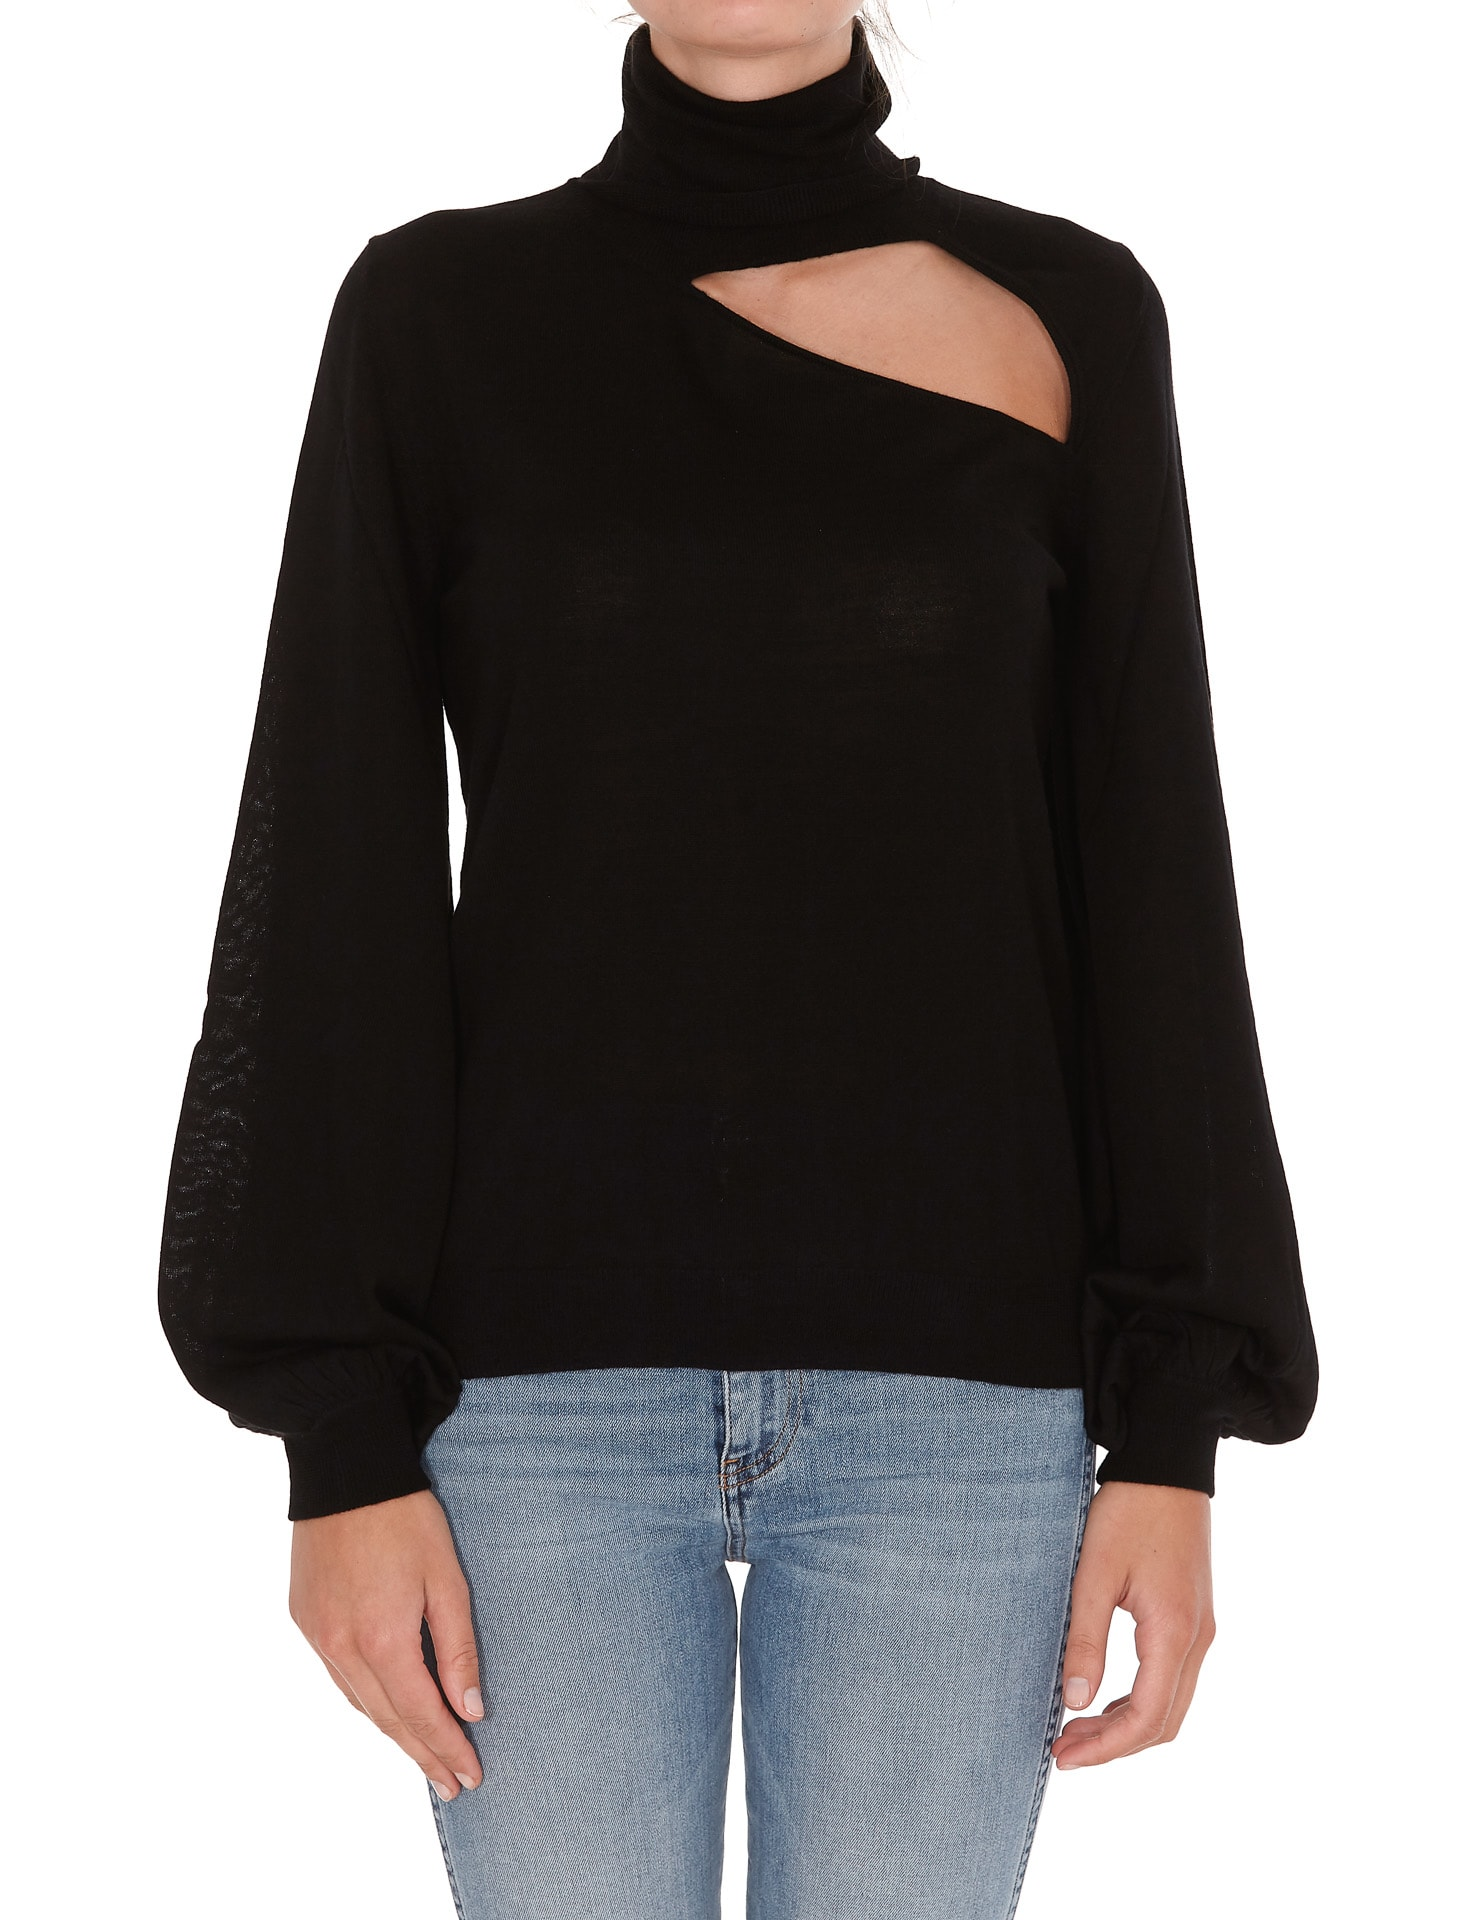 Parosh Lulyx Sweater